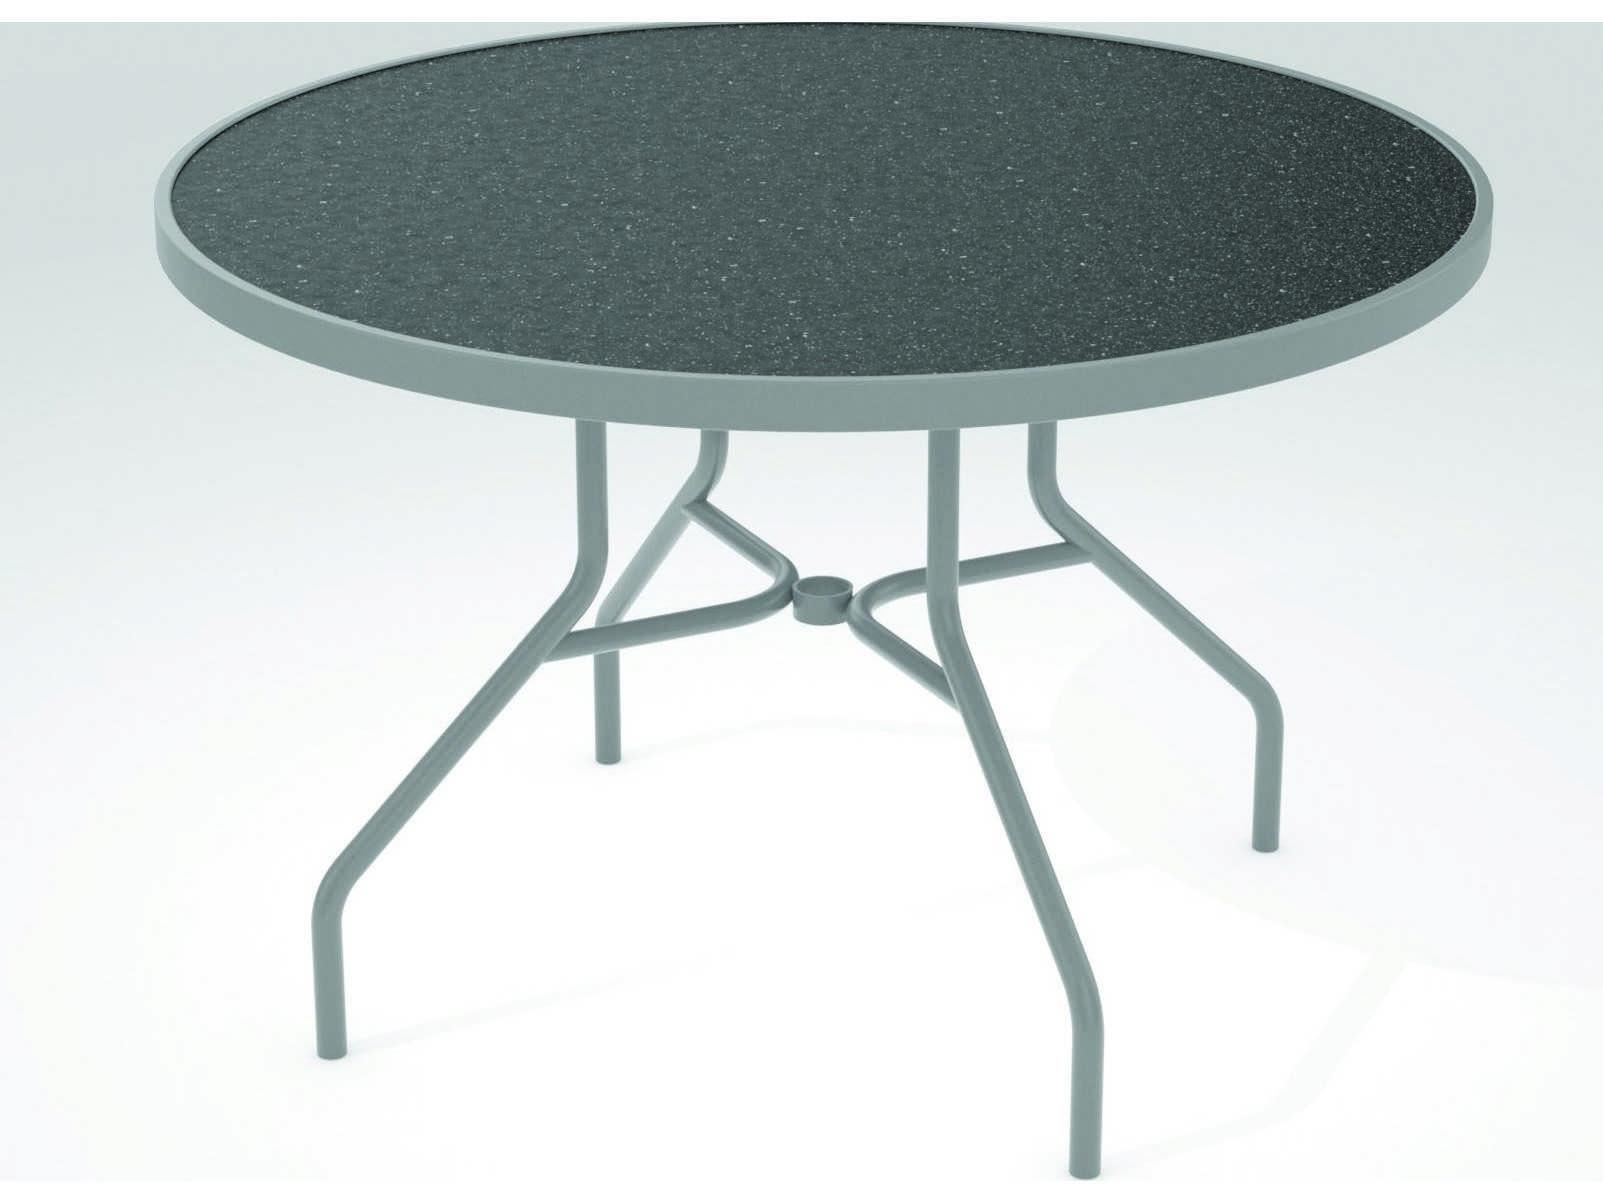 Tropitone Hpl Raduno Aluminum 42 Round Dining Table